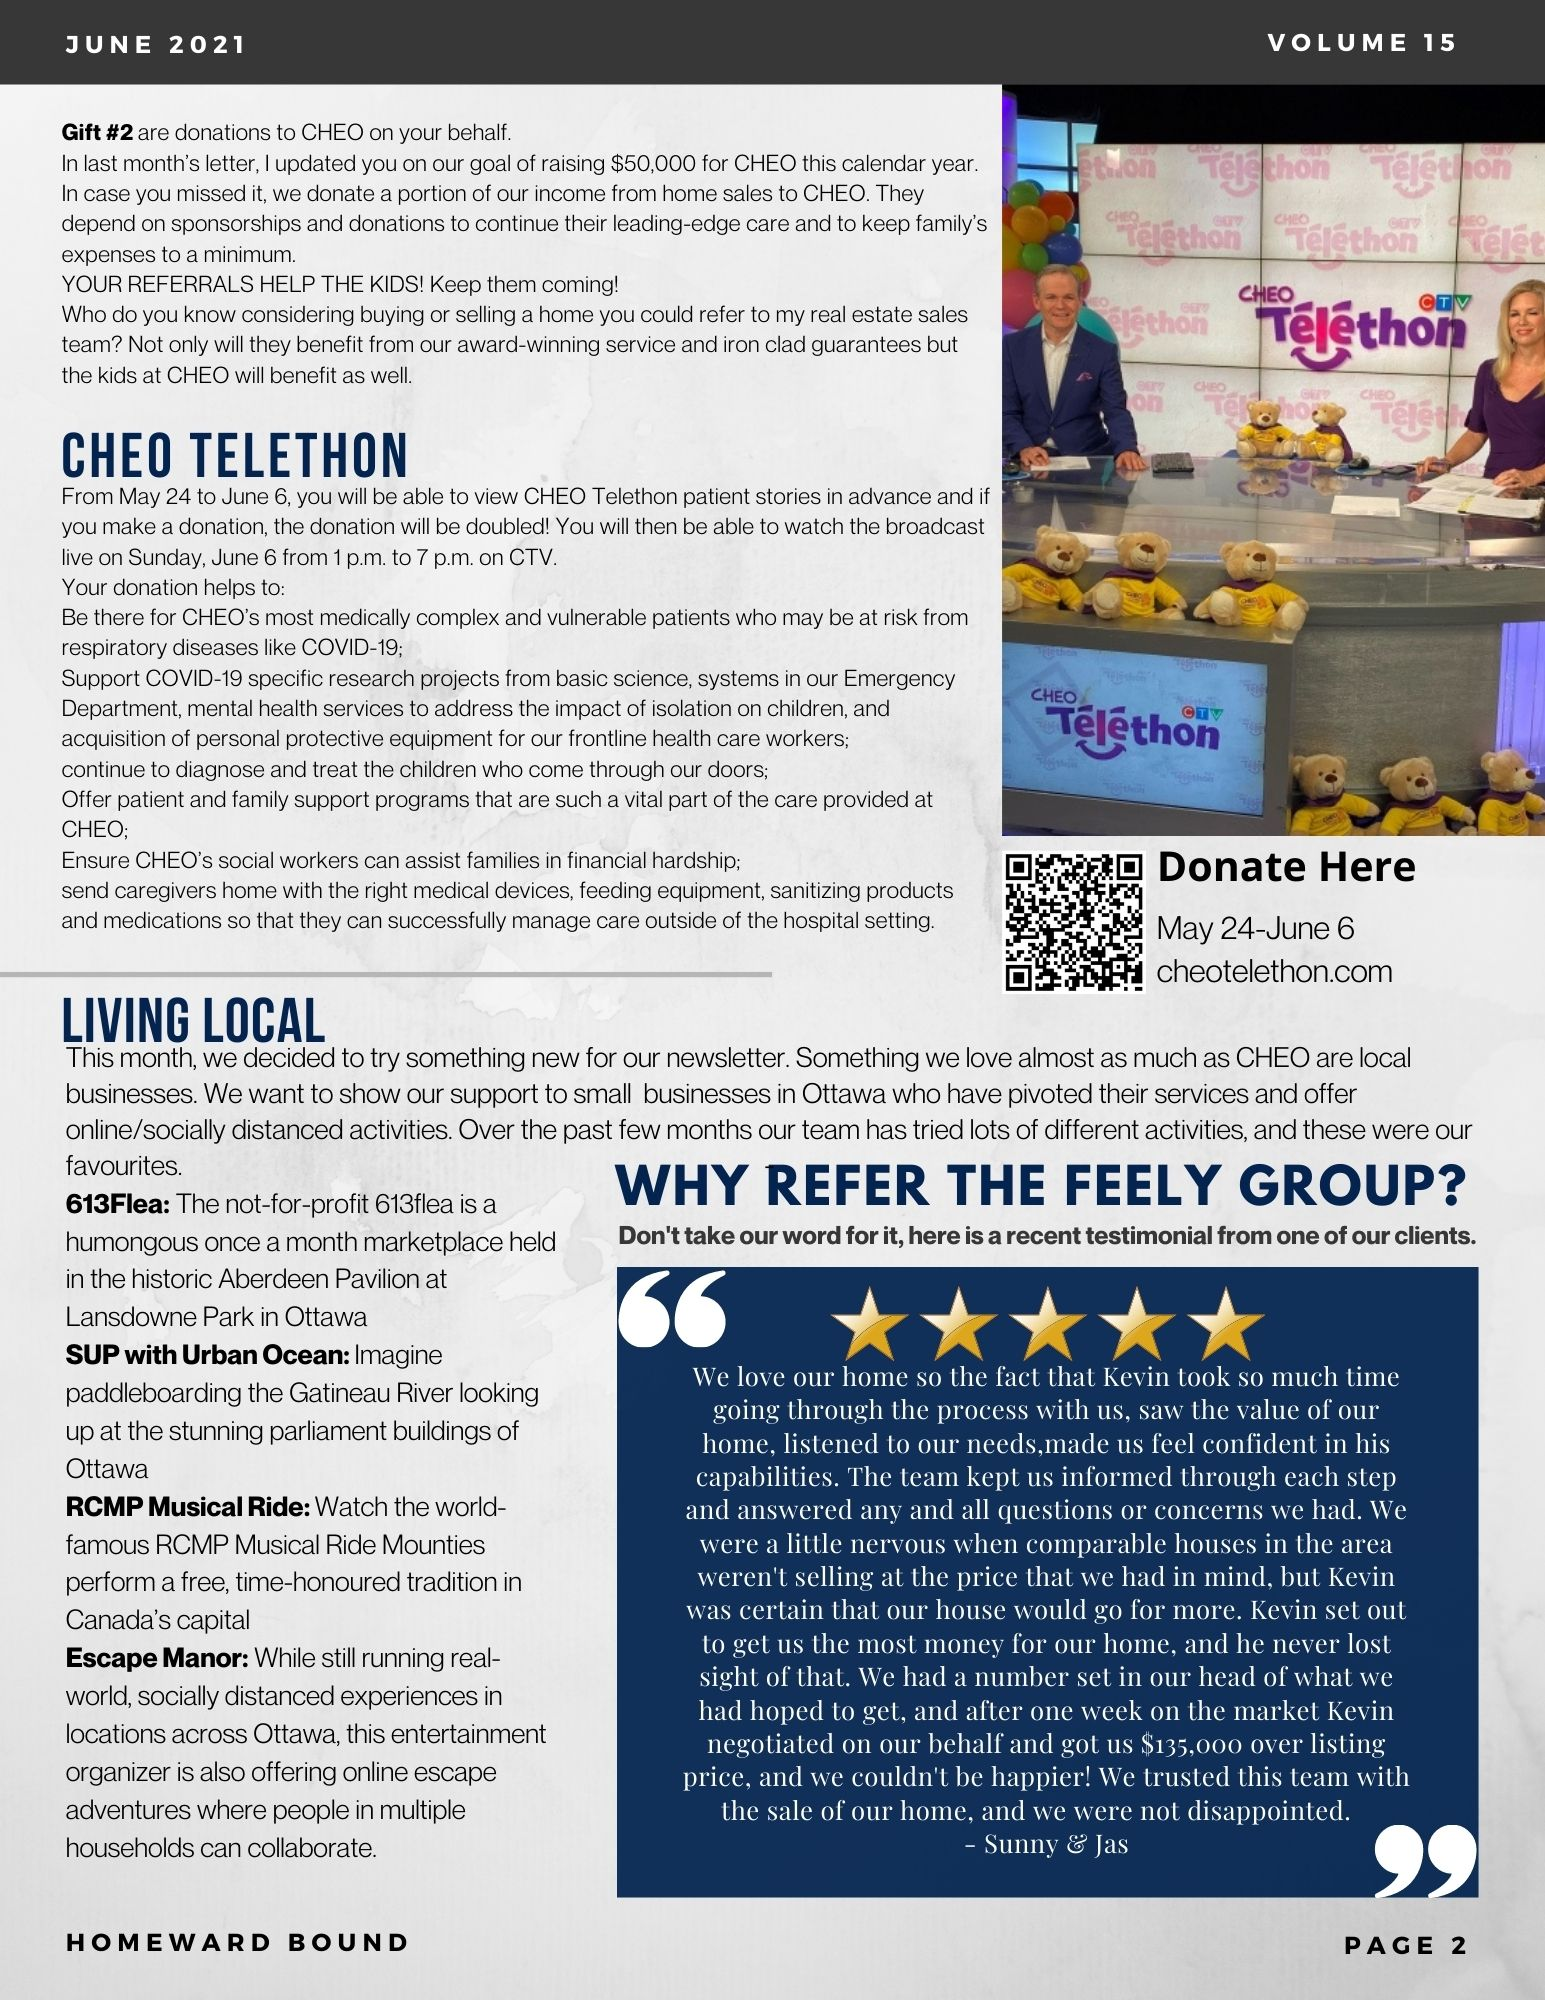 Ottawa Realtors, Feely Group, CHEO, Give Back